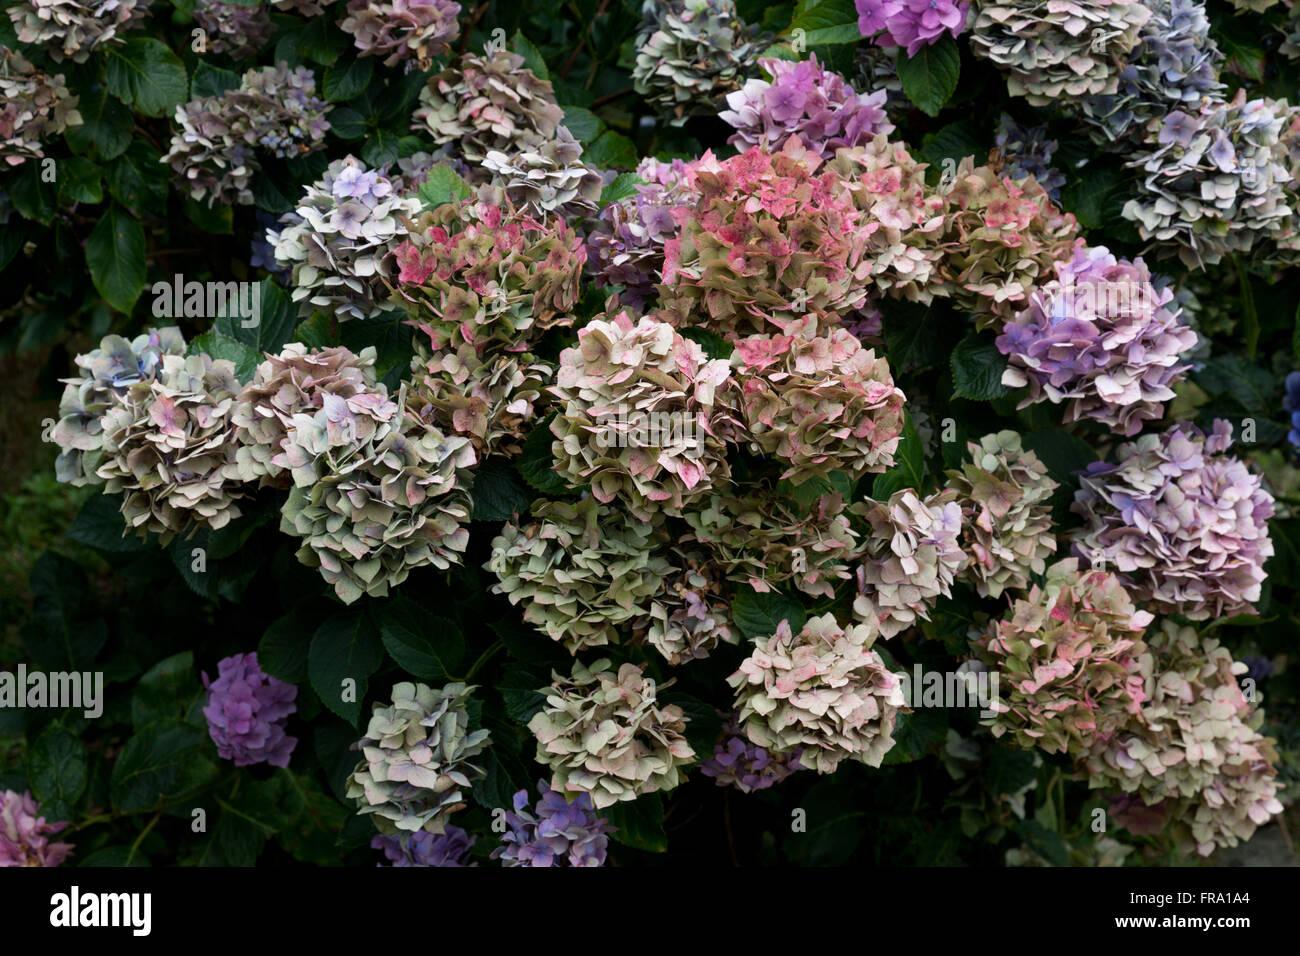 varicolored hydrangea blossoms - Stock Image